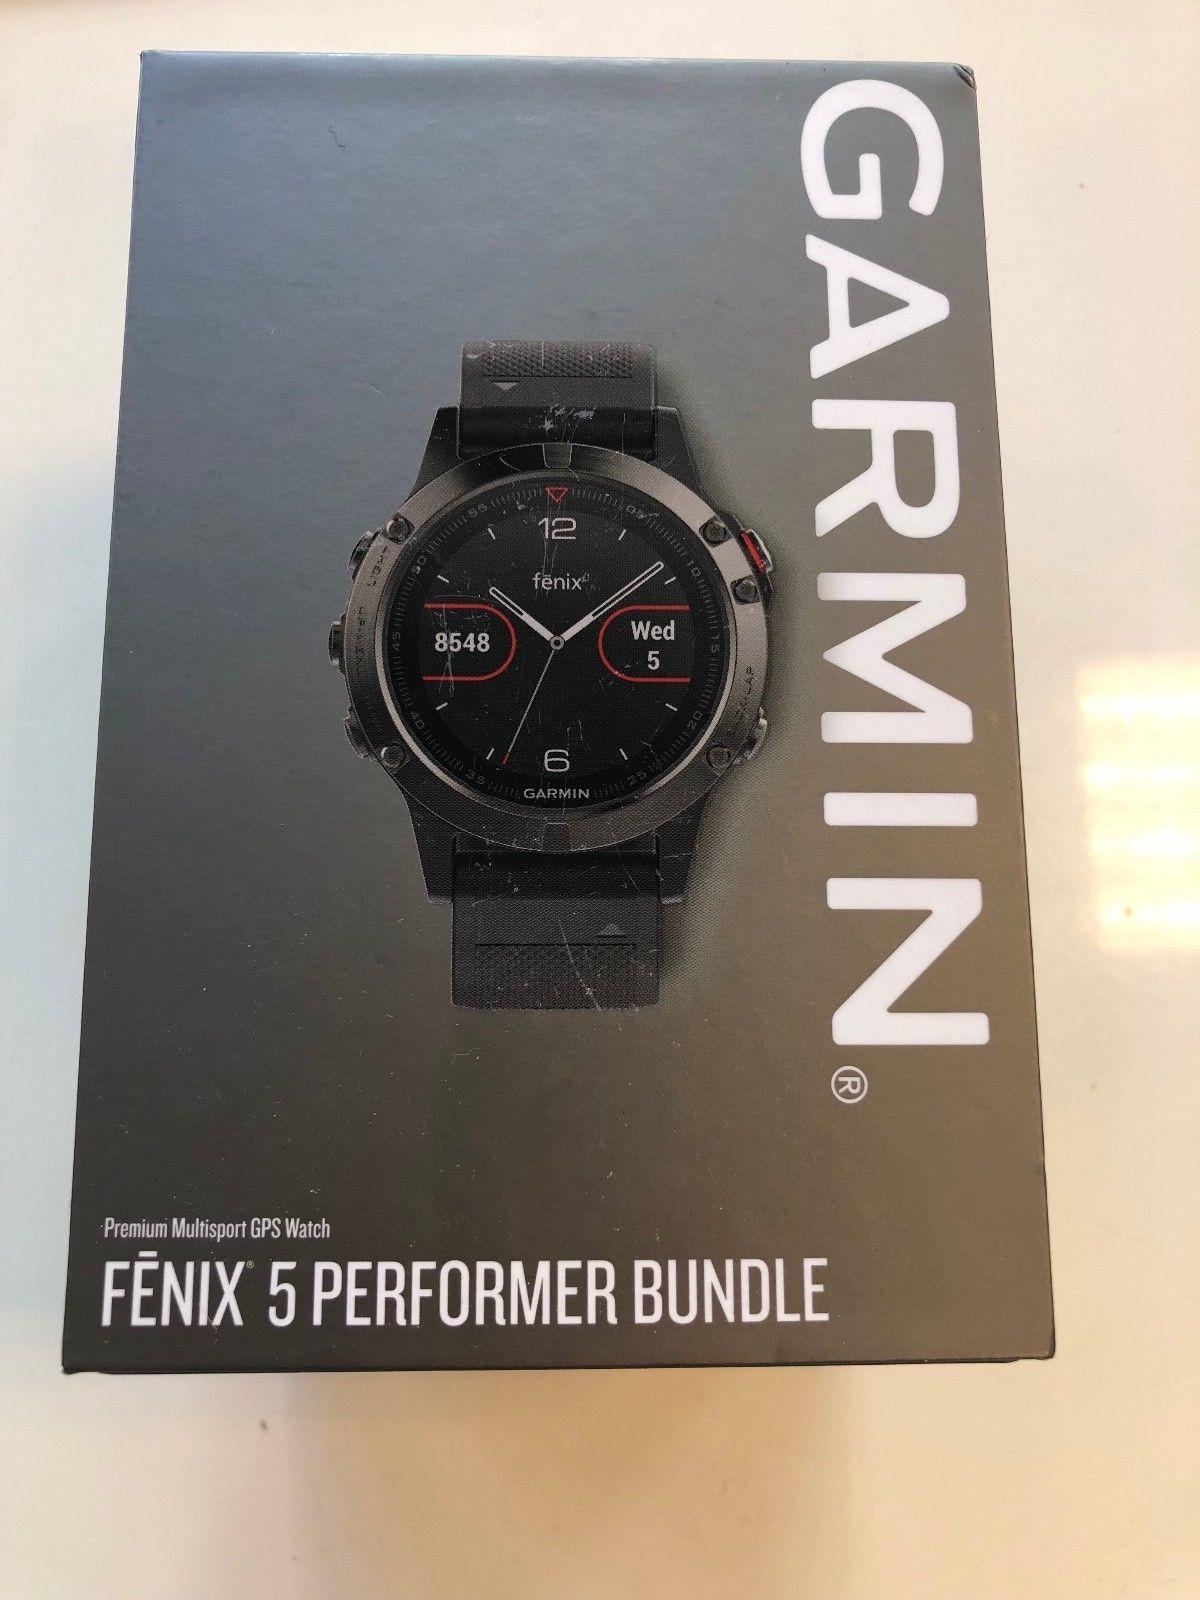 Garmin FENIX 5 Performer Bundle NAGEL NEU ungeöffnet Inkl. Rechnung